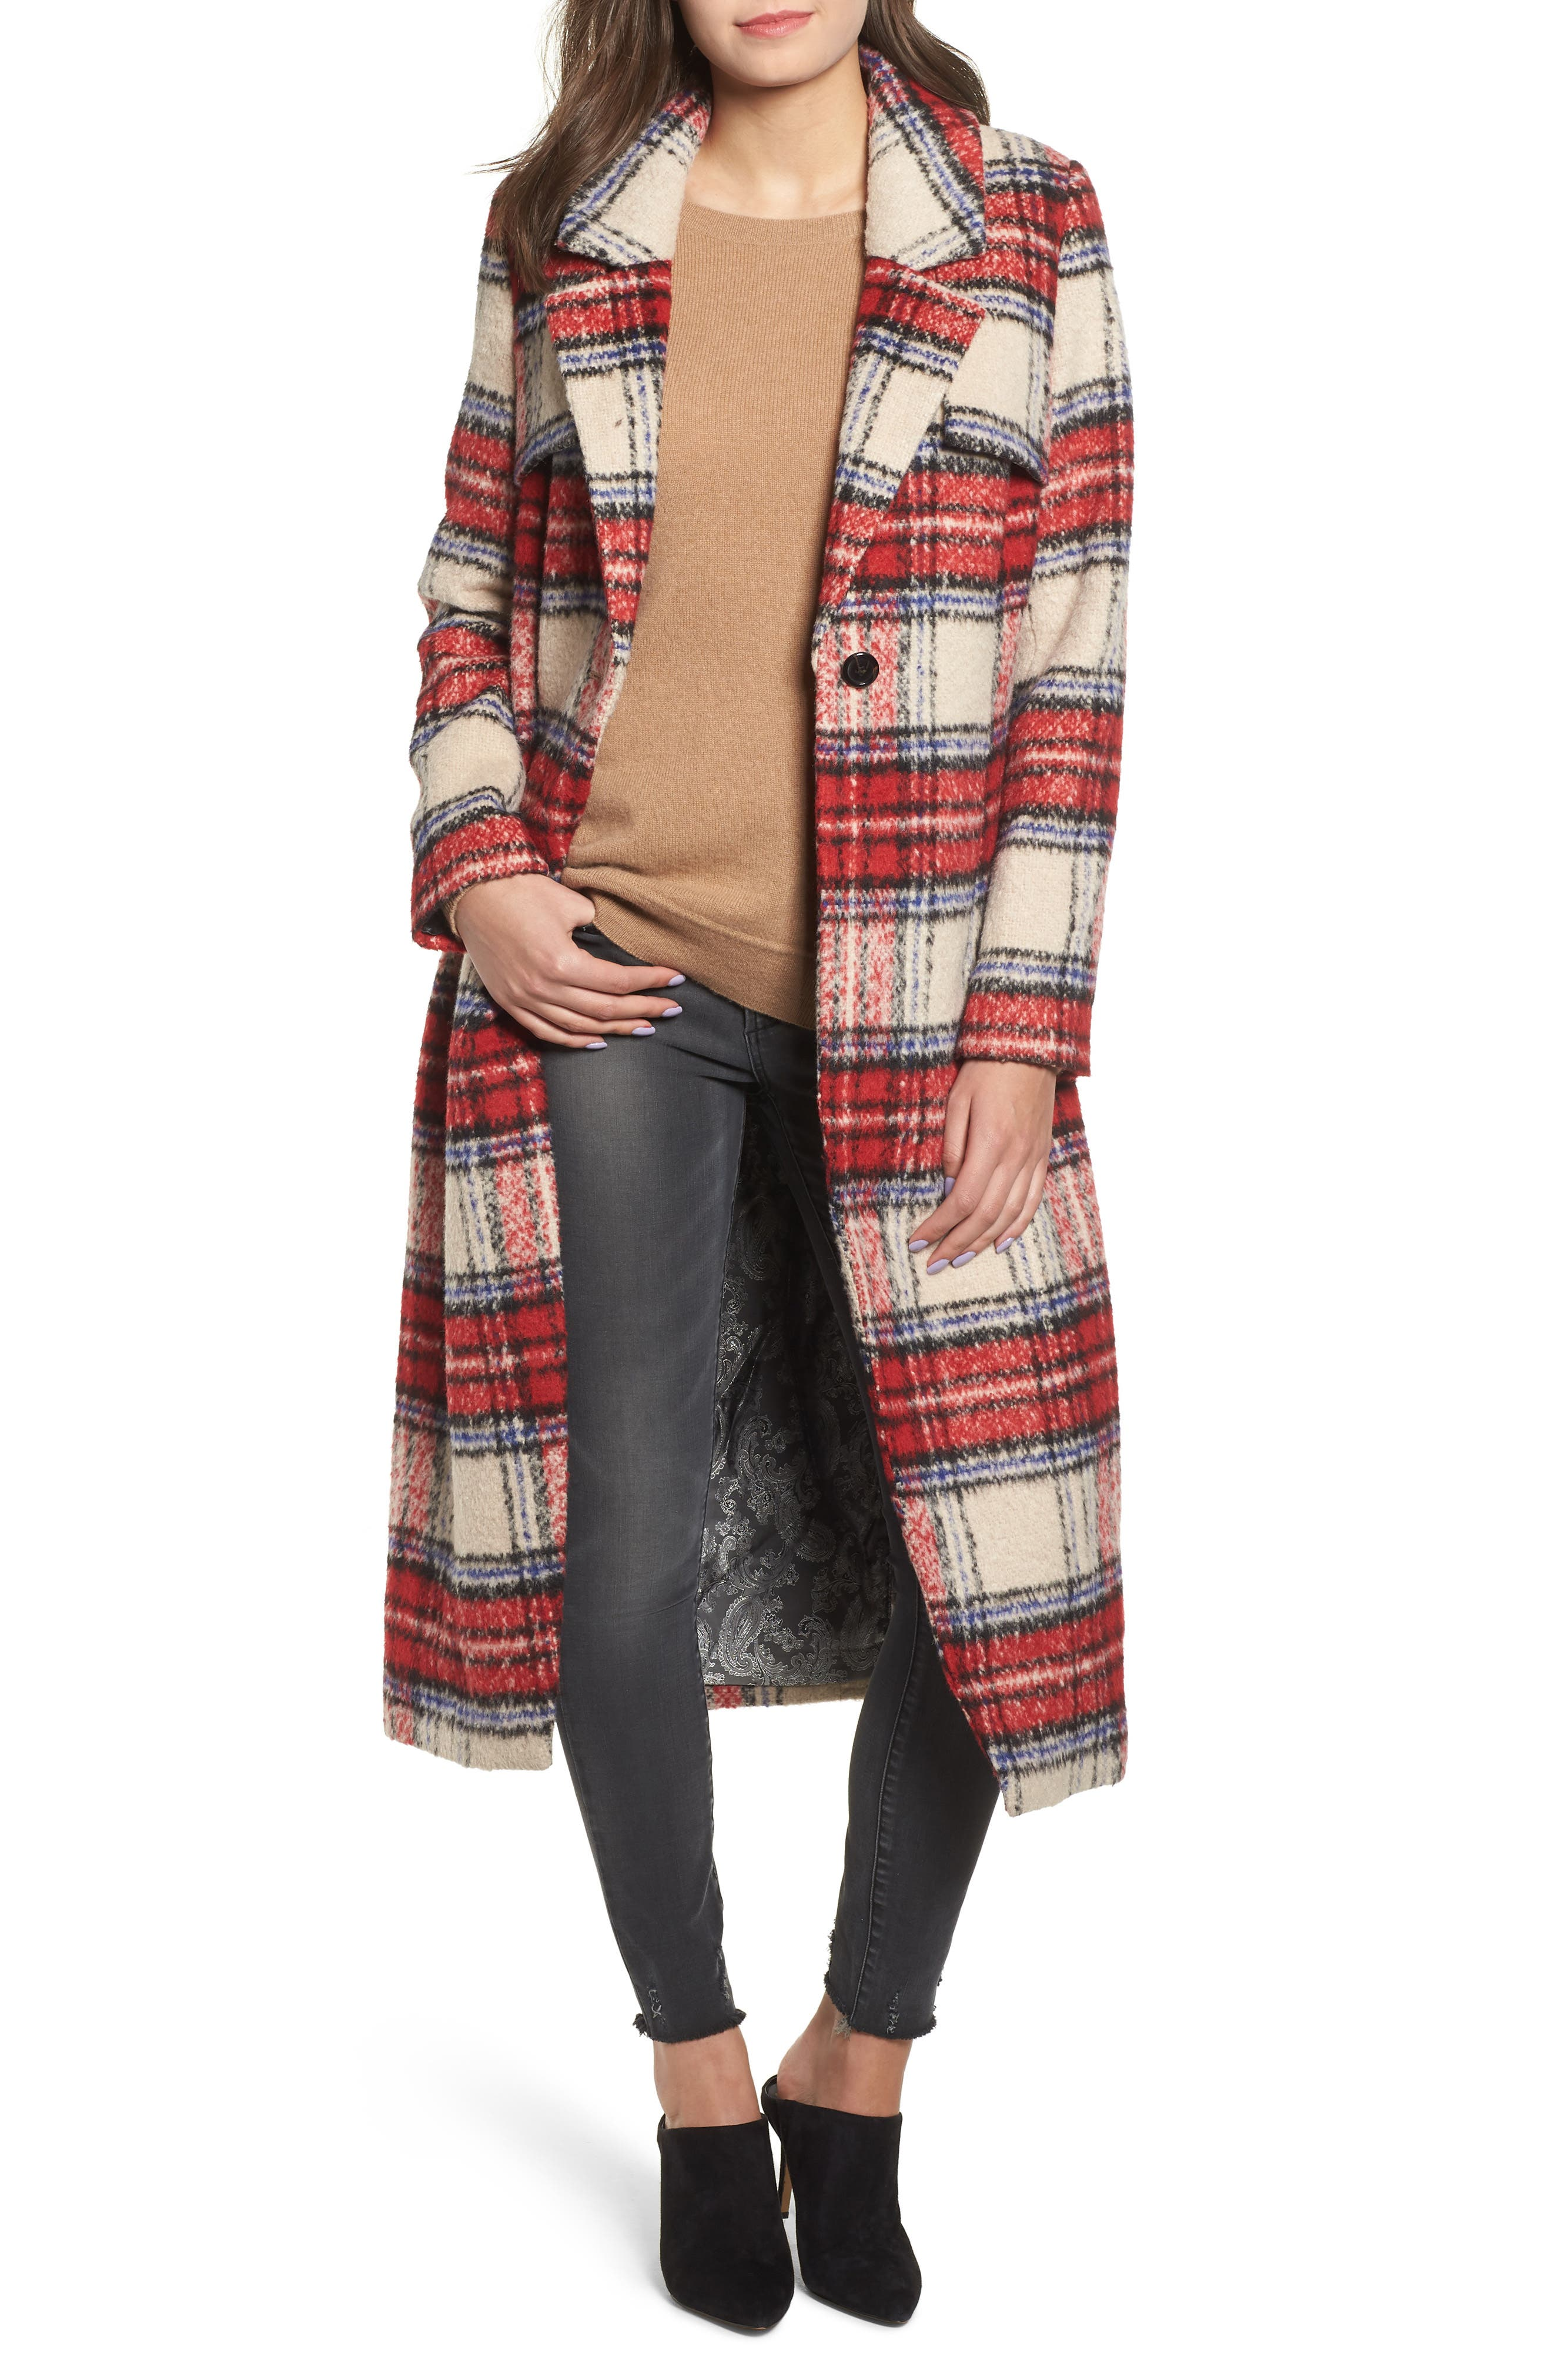 Vintage Coats & Jackets | Retro Coats and Jackets Womens Nvlt Plaid Long Coat $99.90 AT vintagedancer.com